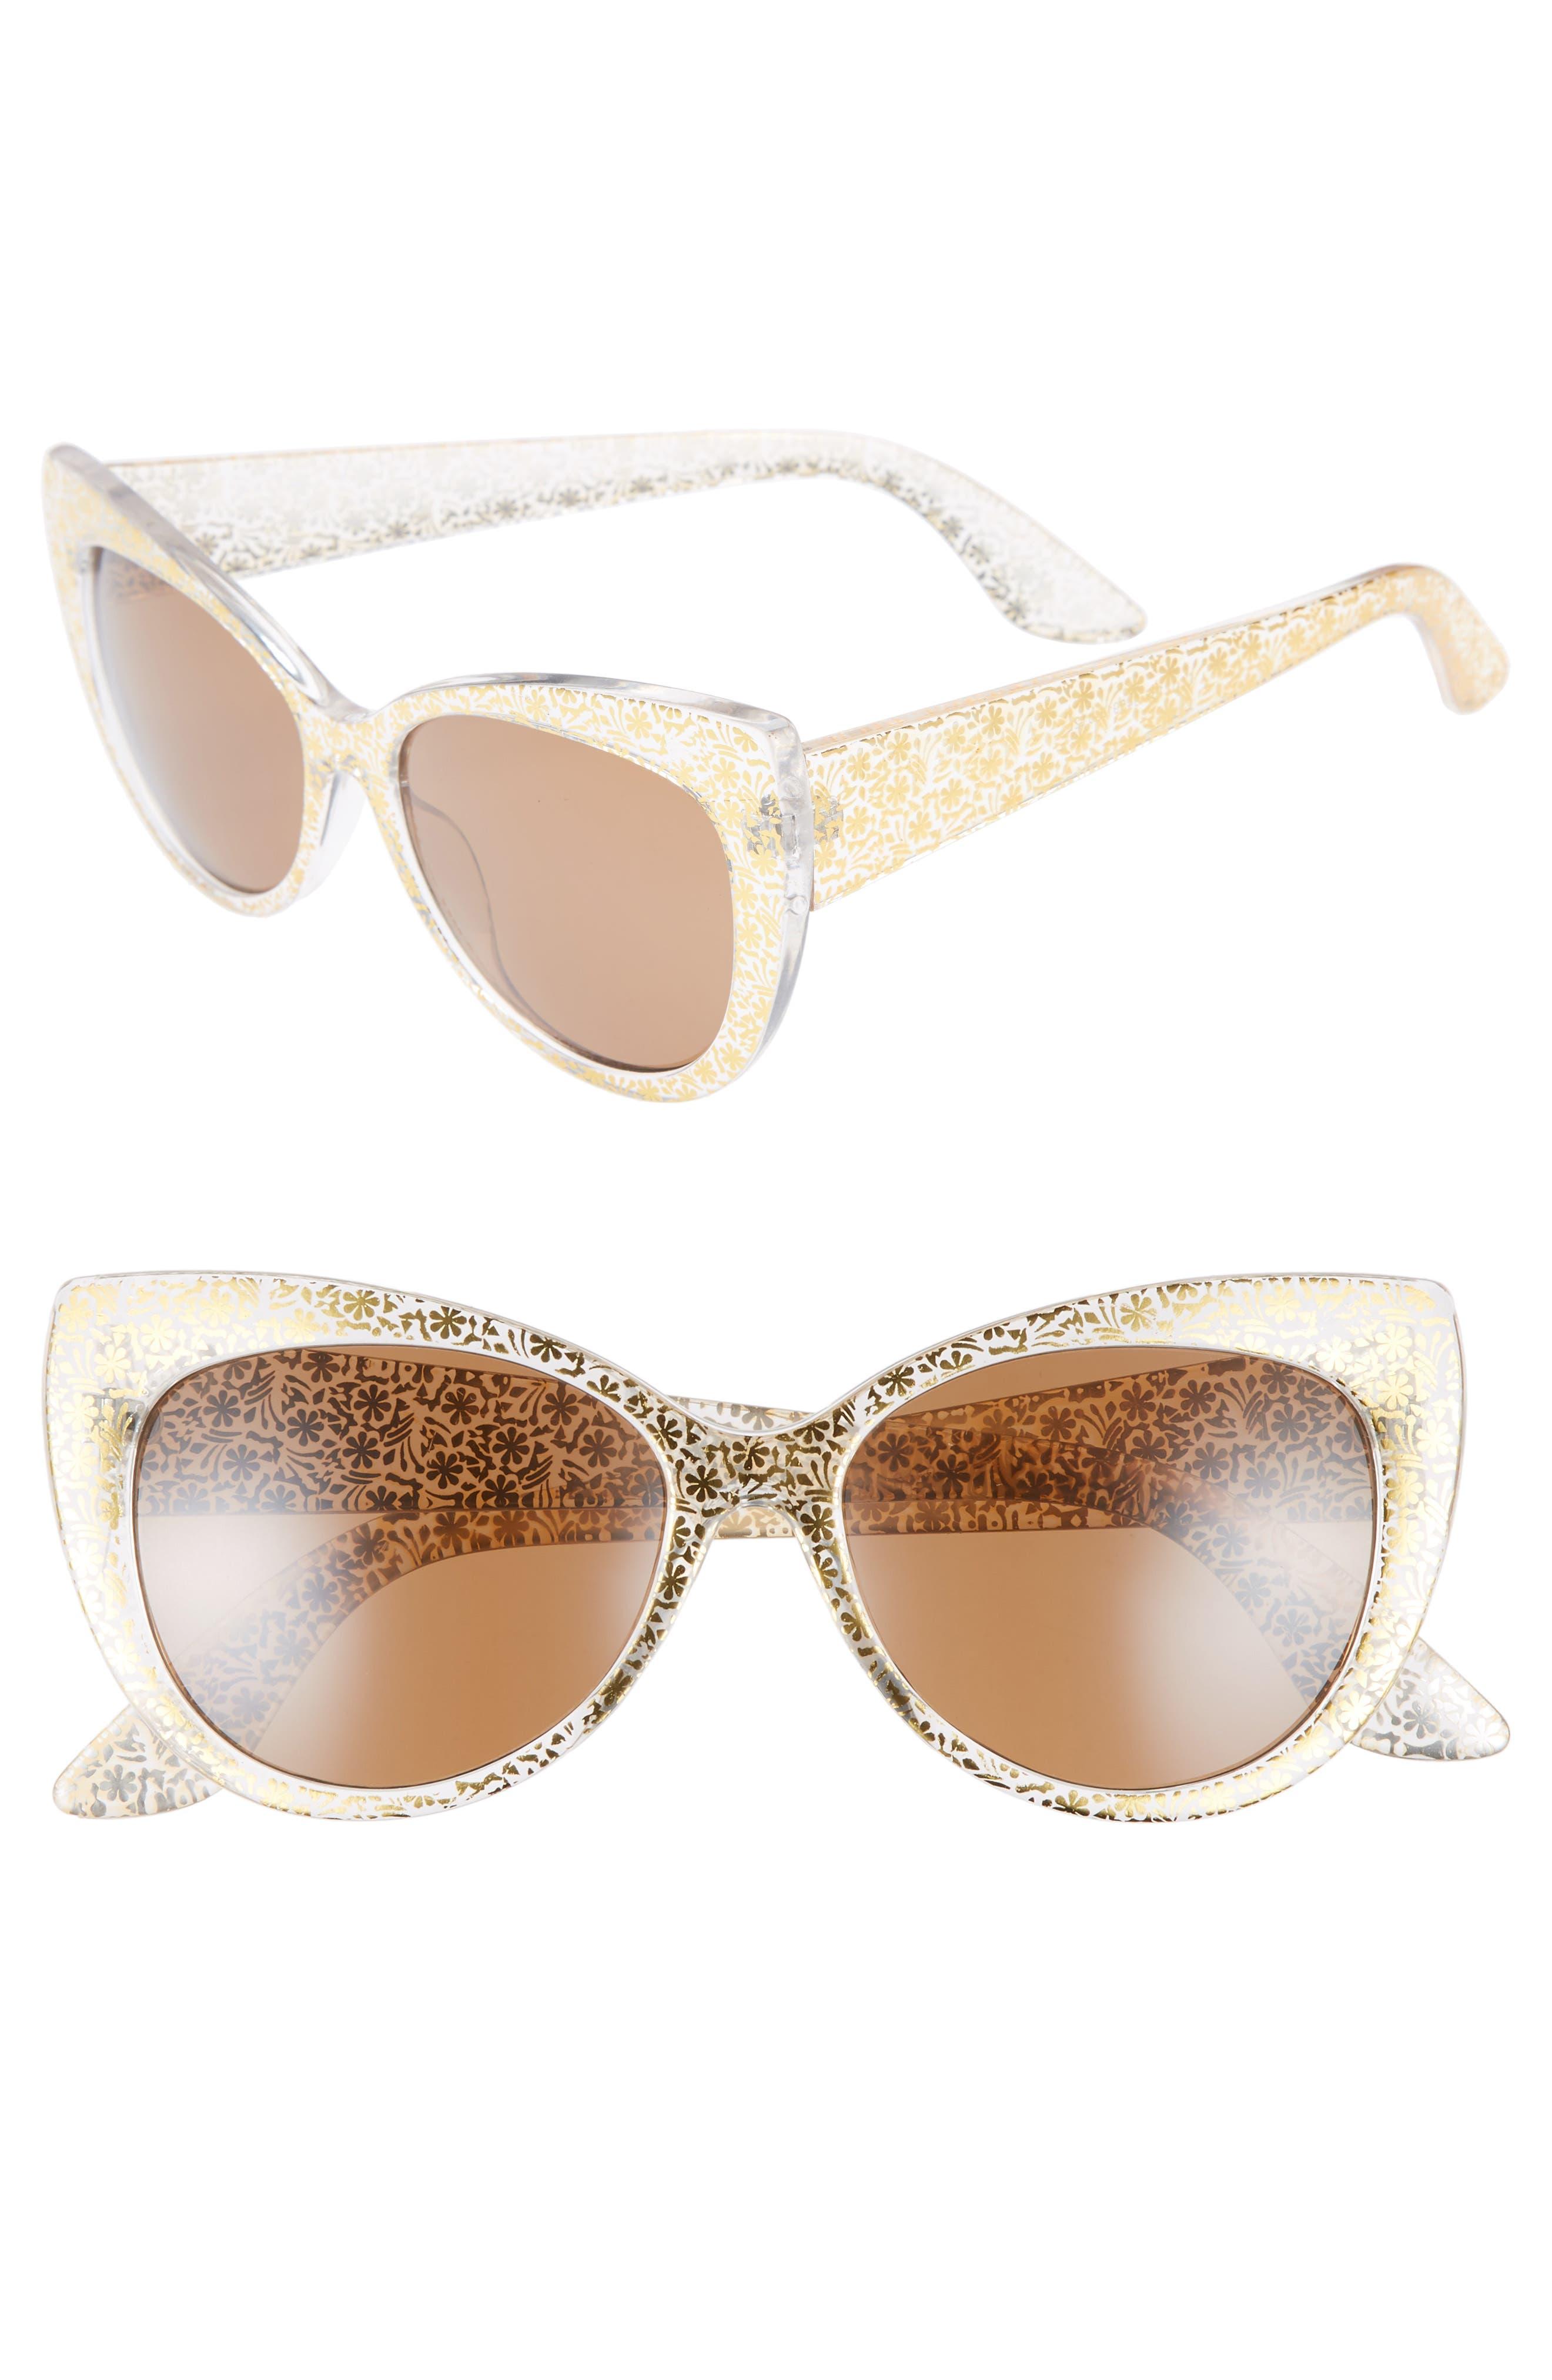 55mm Floral Cat Eye Sunglasses,                             Main thumbnail 2, color,